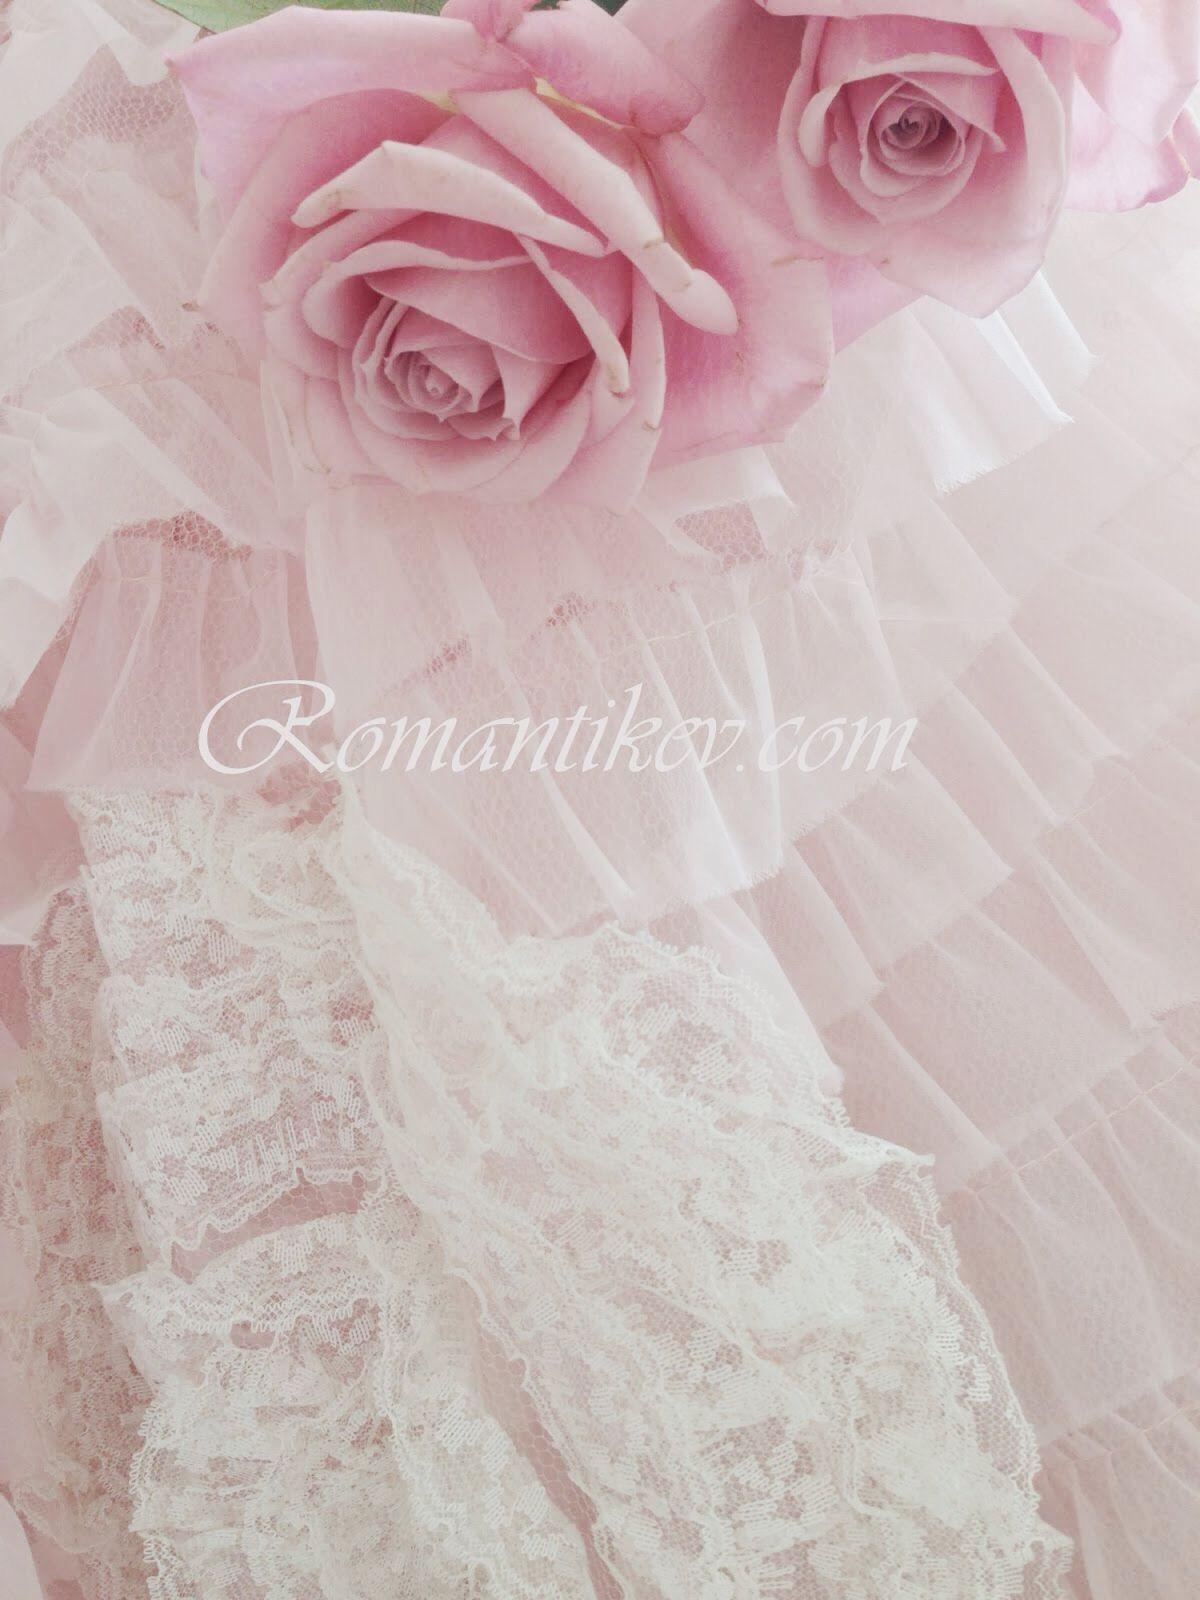 Romantic Shabby chic Vintage elbise Romantikevim